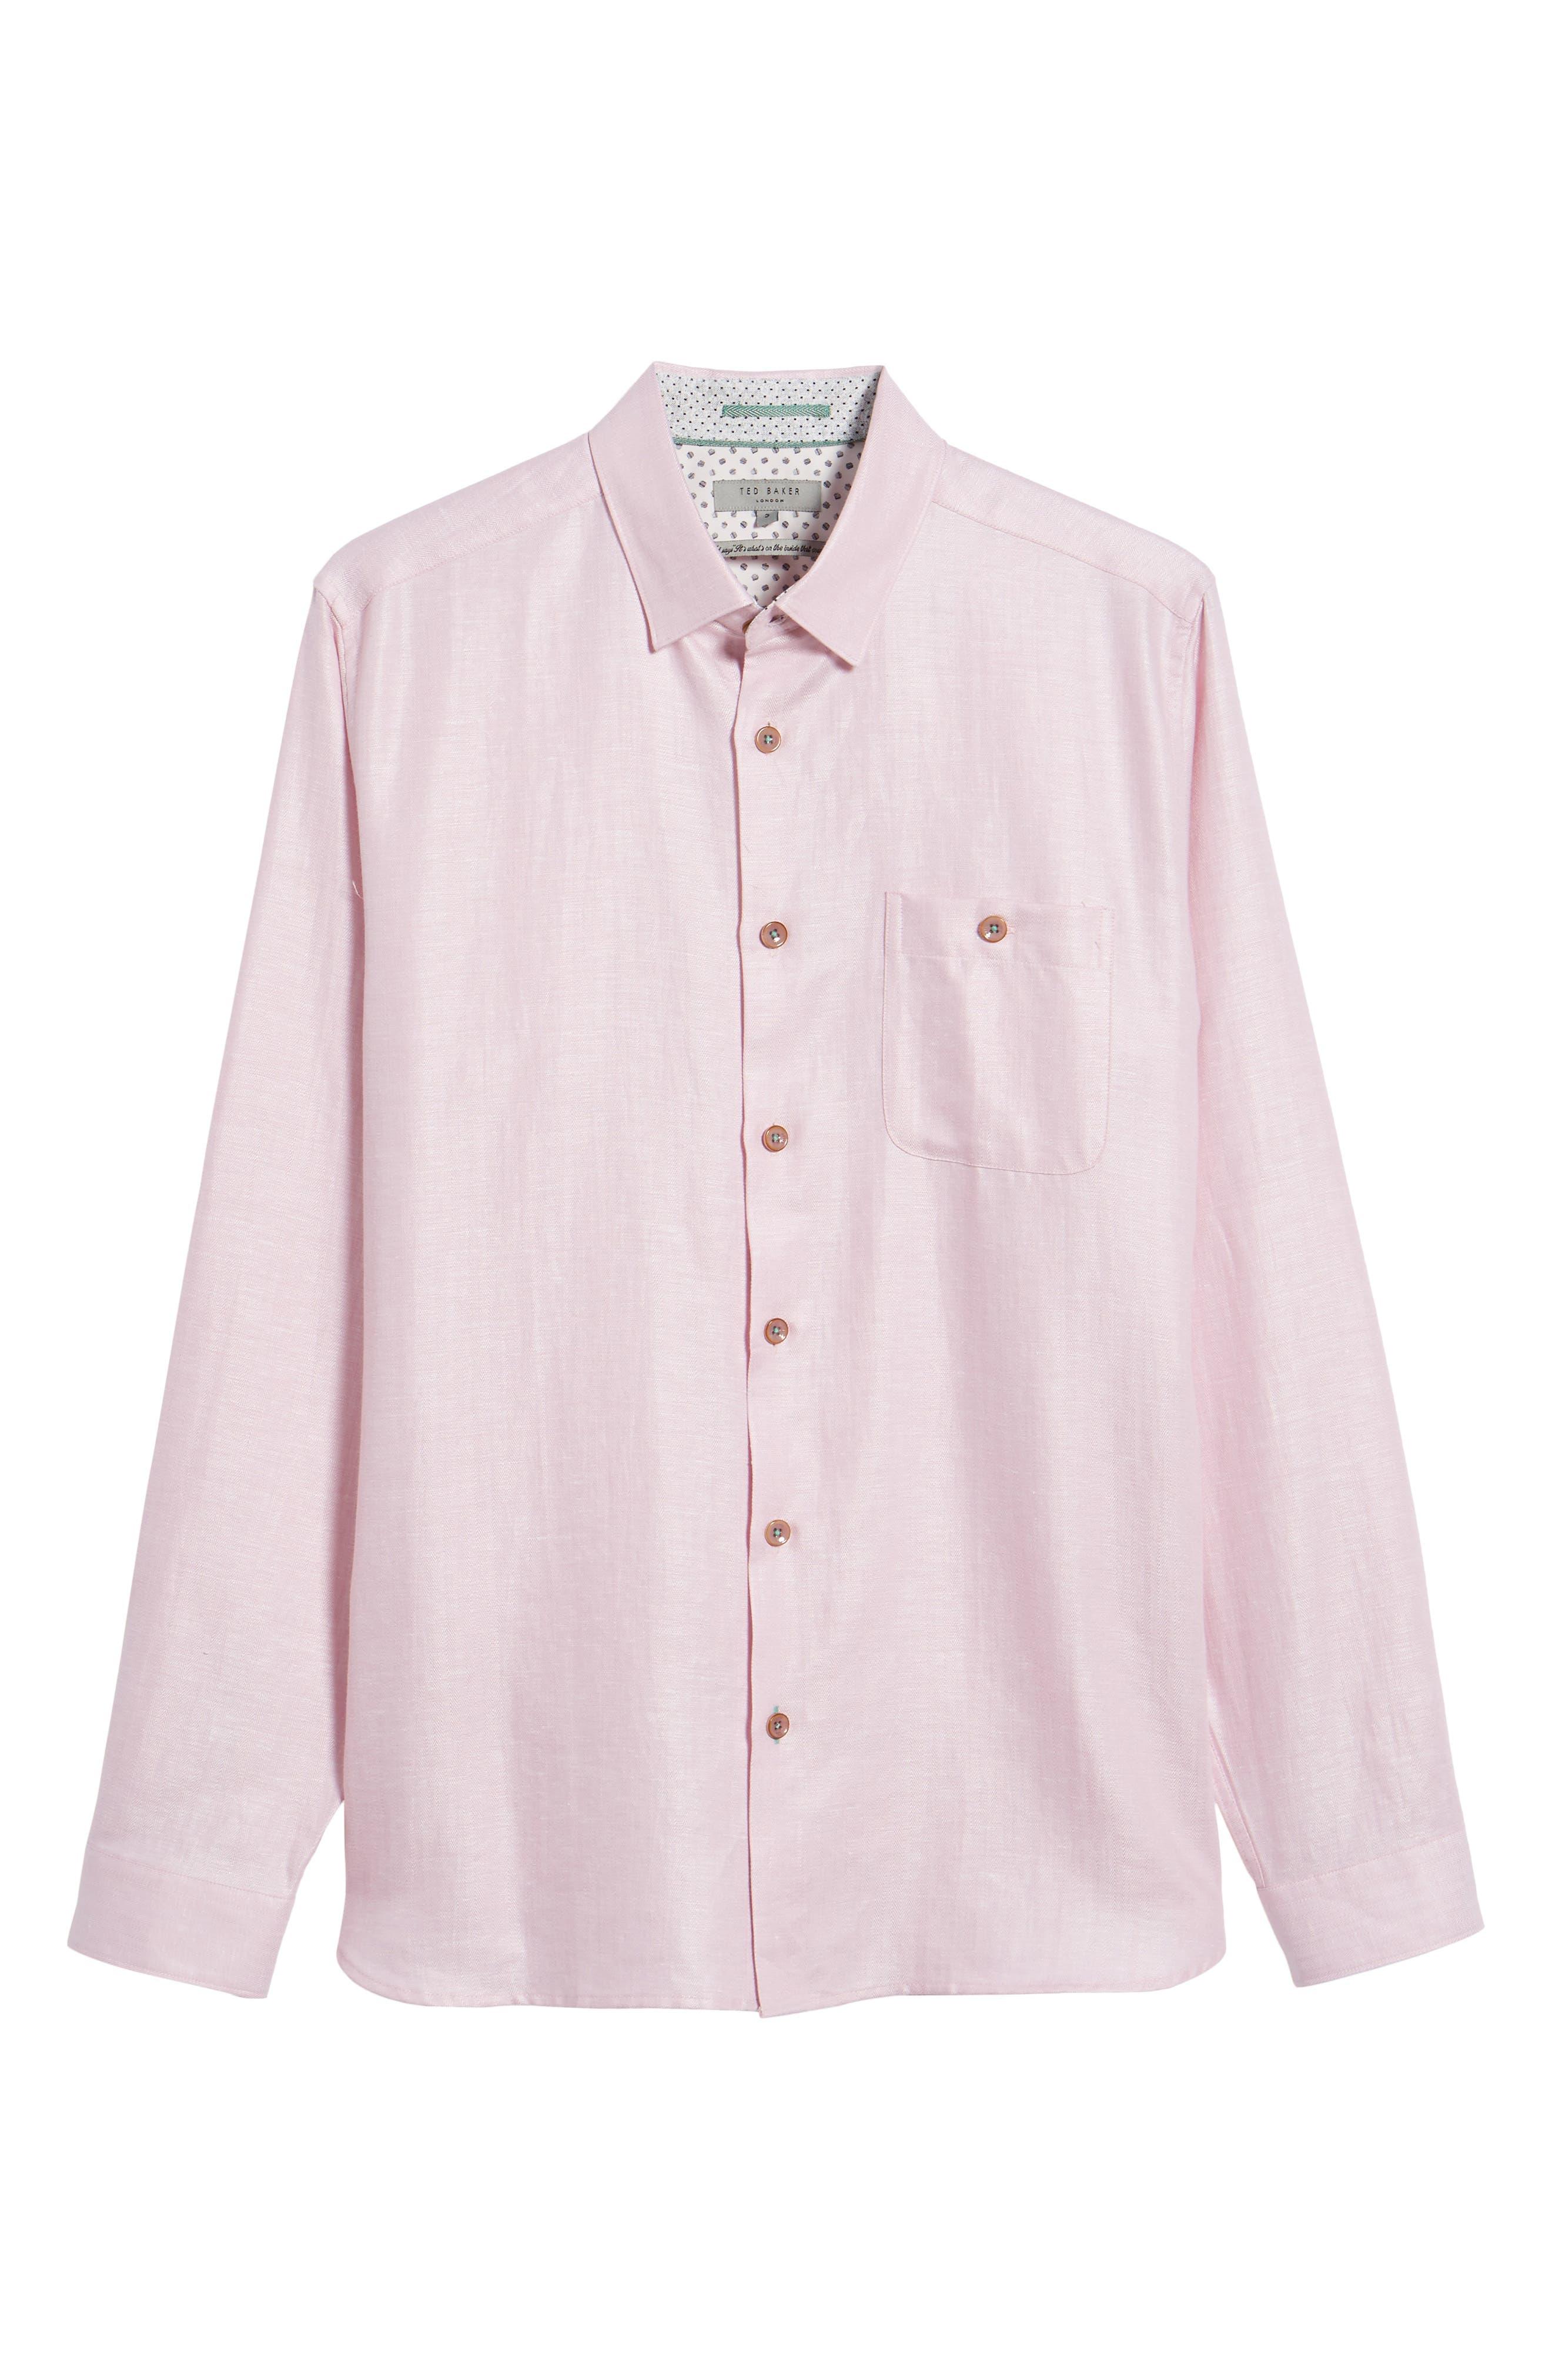 Linlins Herringbone Cotton & Linen Sport Shirt,                             Alternate thumbnail 28, color,